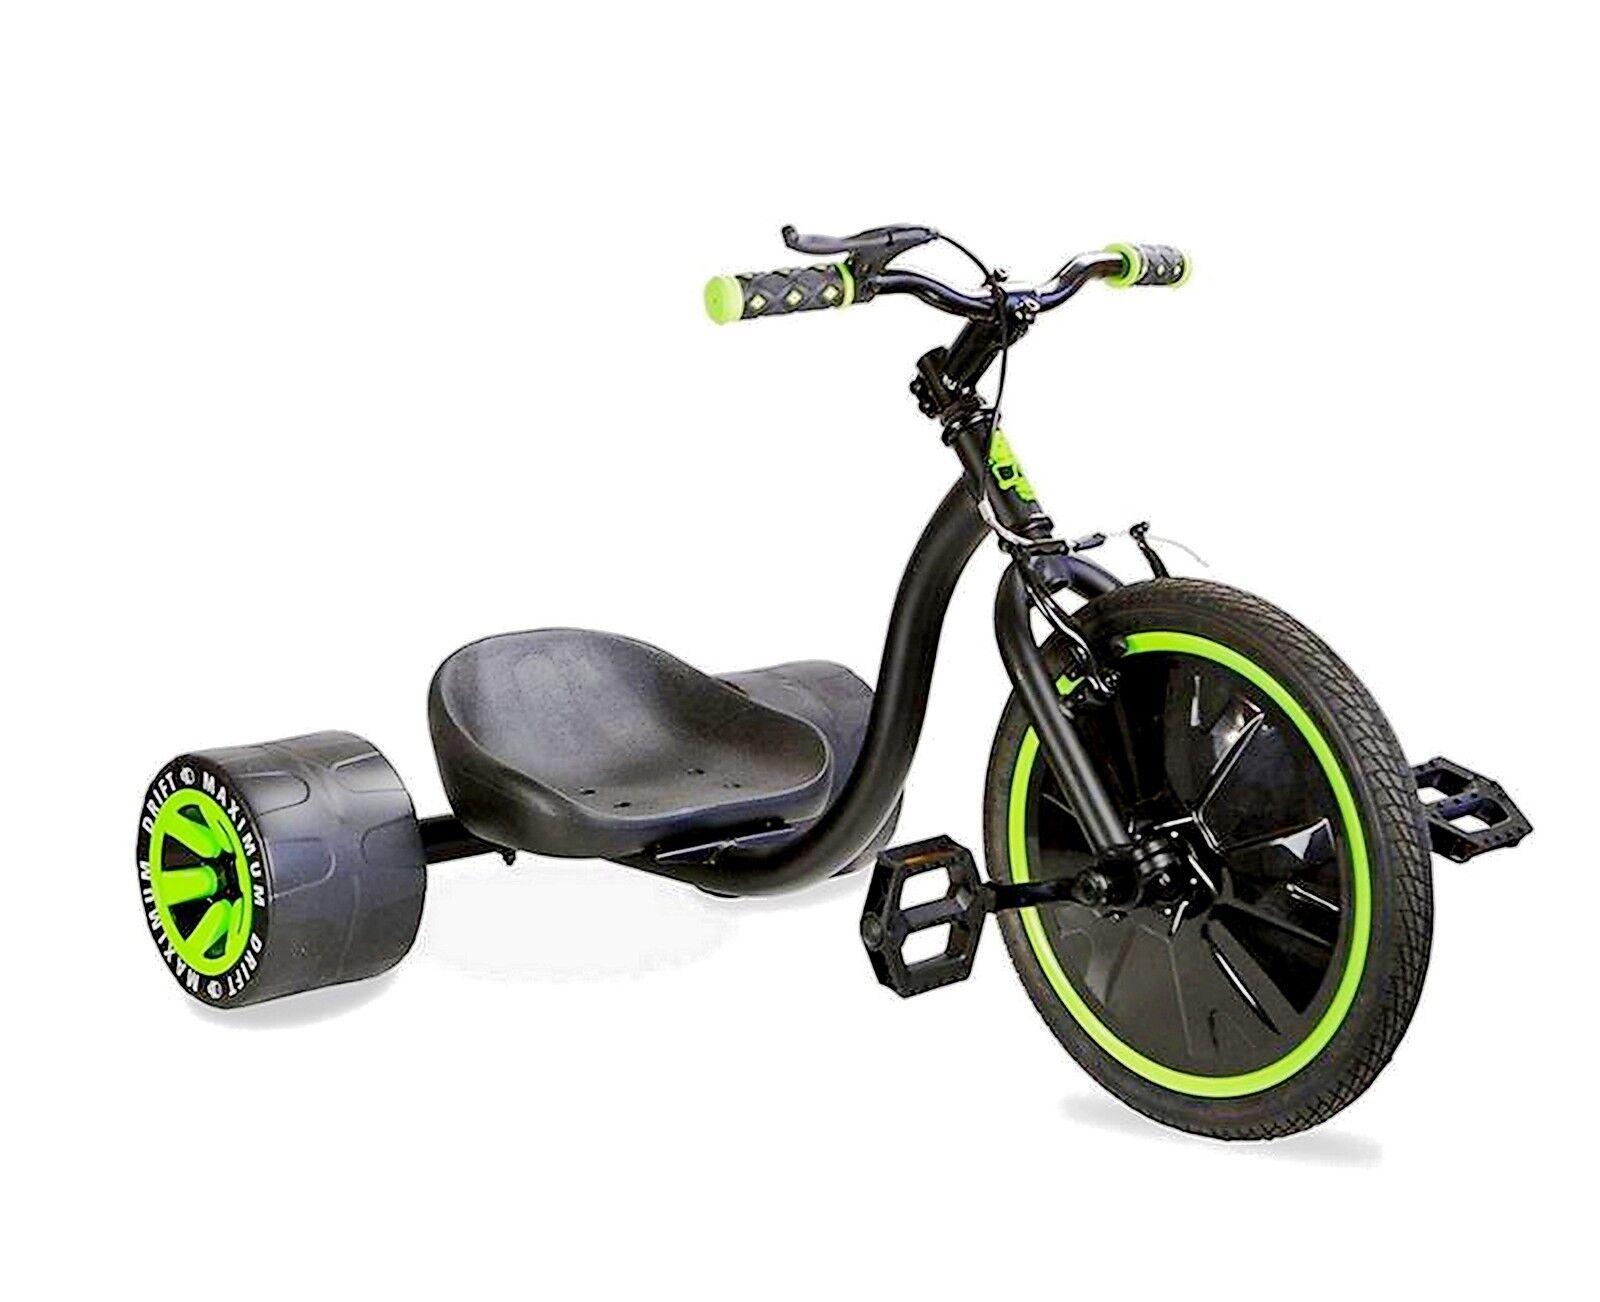 MGP Madd Gear Dreirad mini Drift Trike Bike 16 zoll  Drifter bis 75 Kg